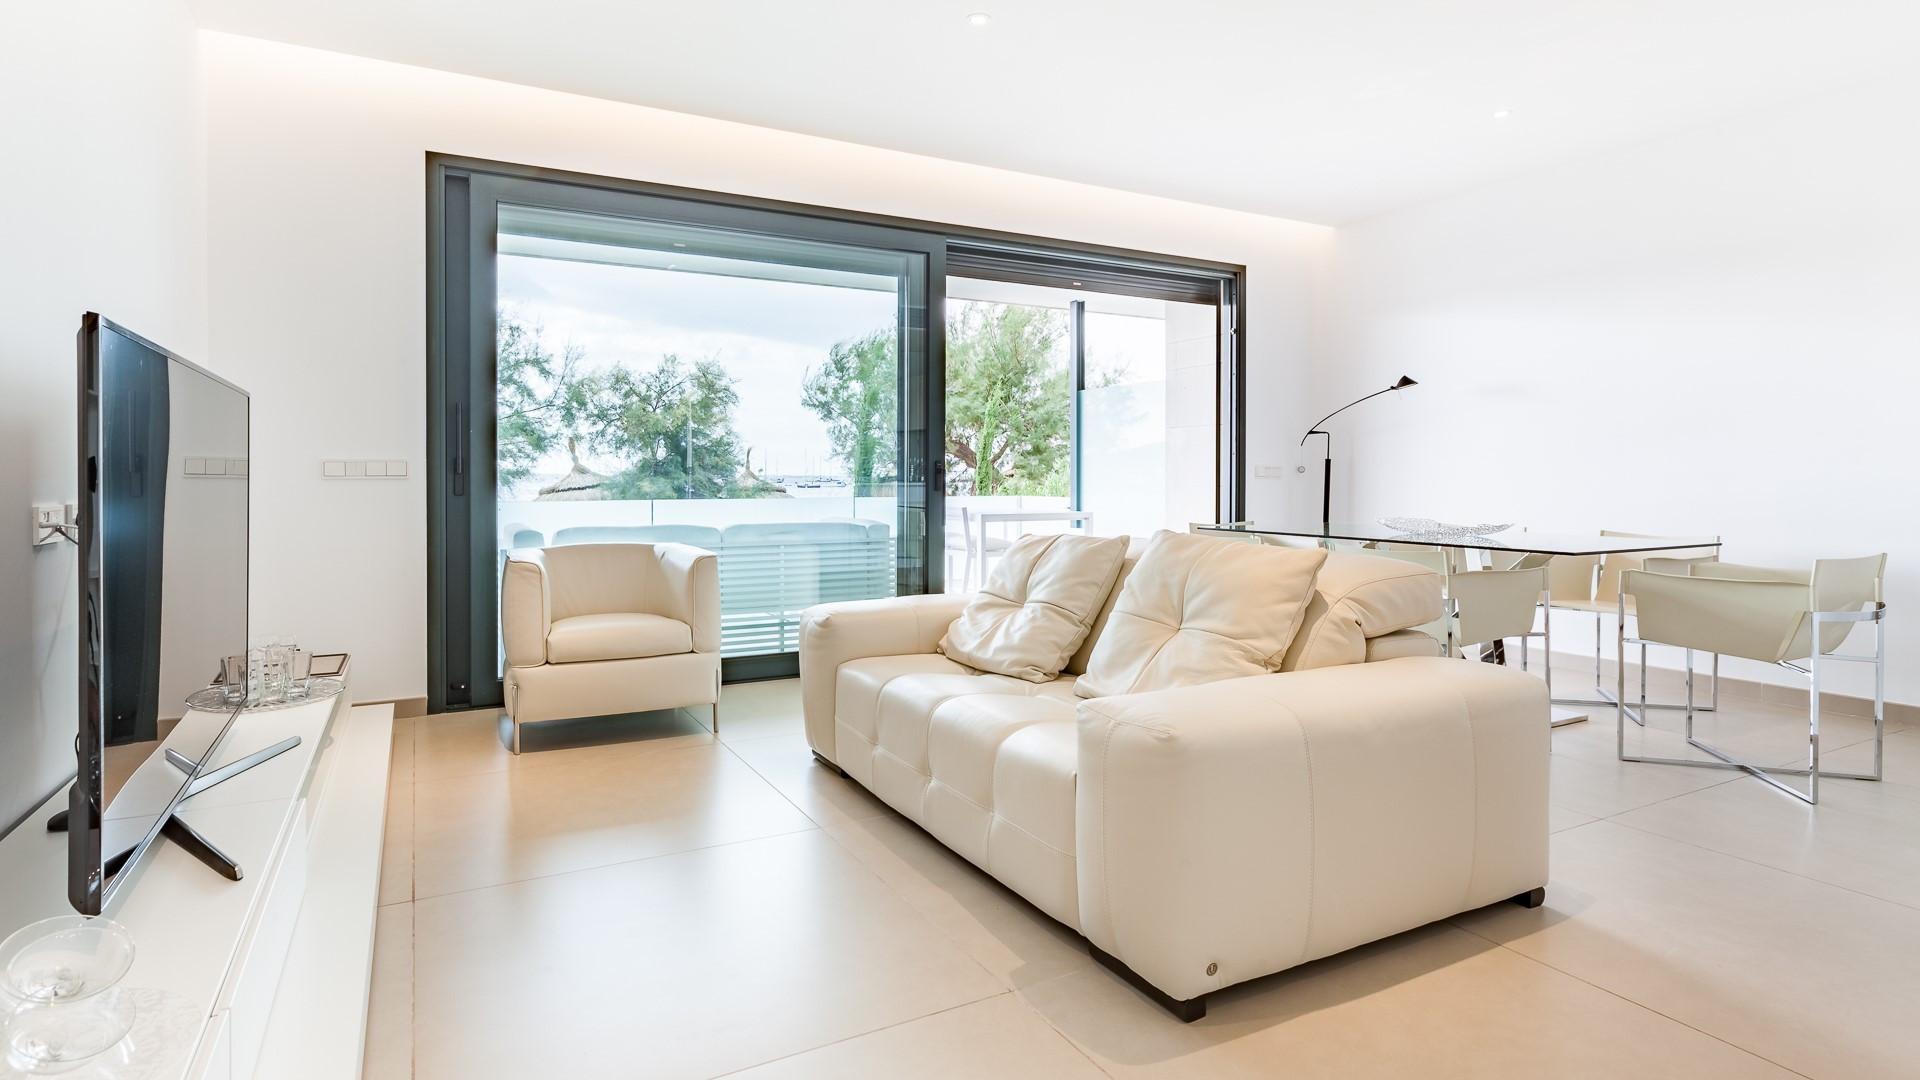 Apartment for rent Algarve Beachfront 2 Bedroom Apartment Pollenca High Standard And Sea Views